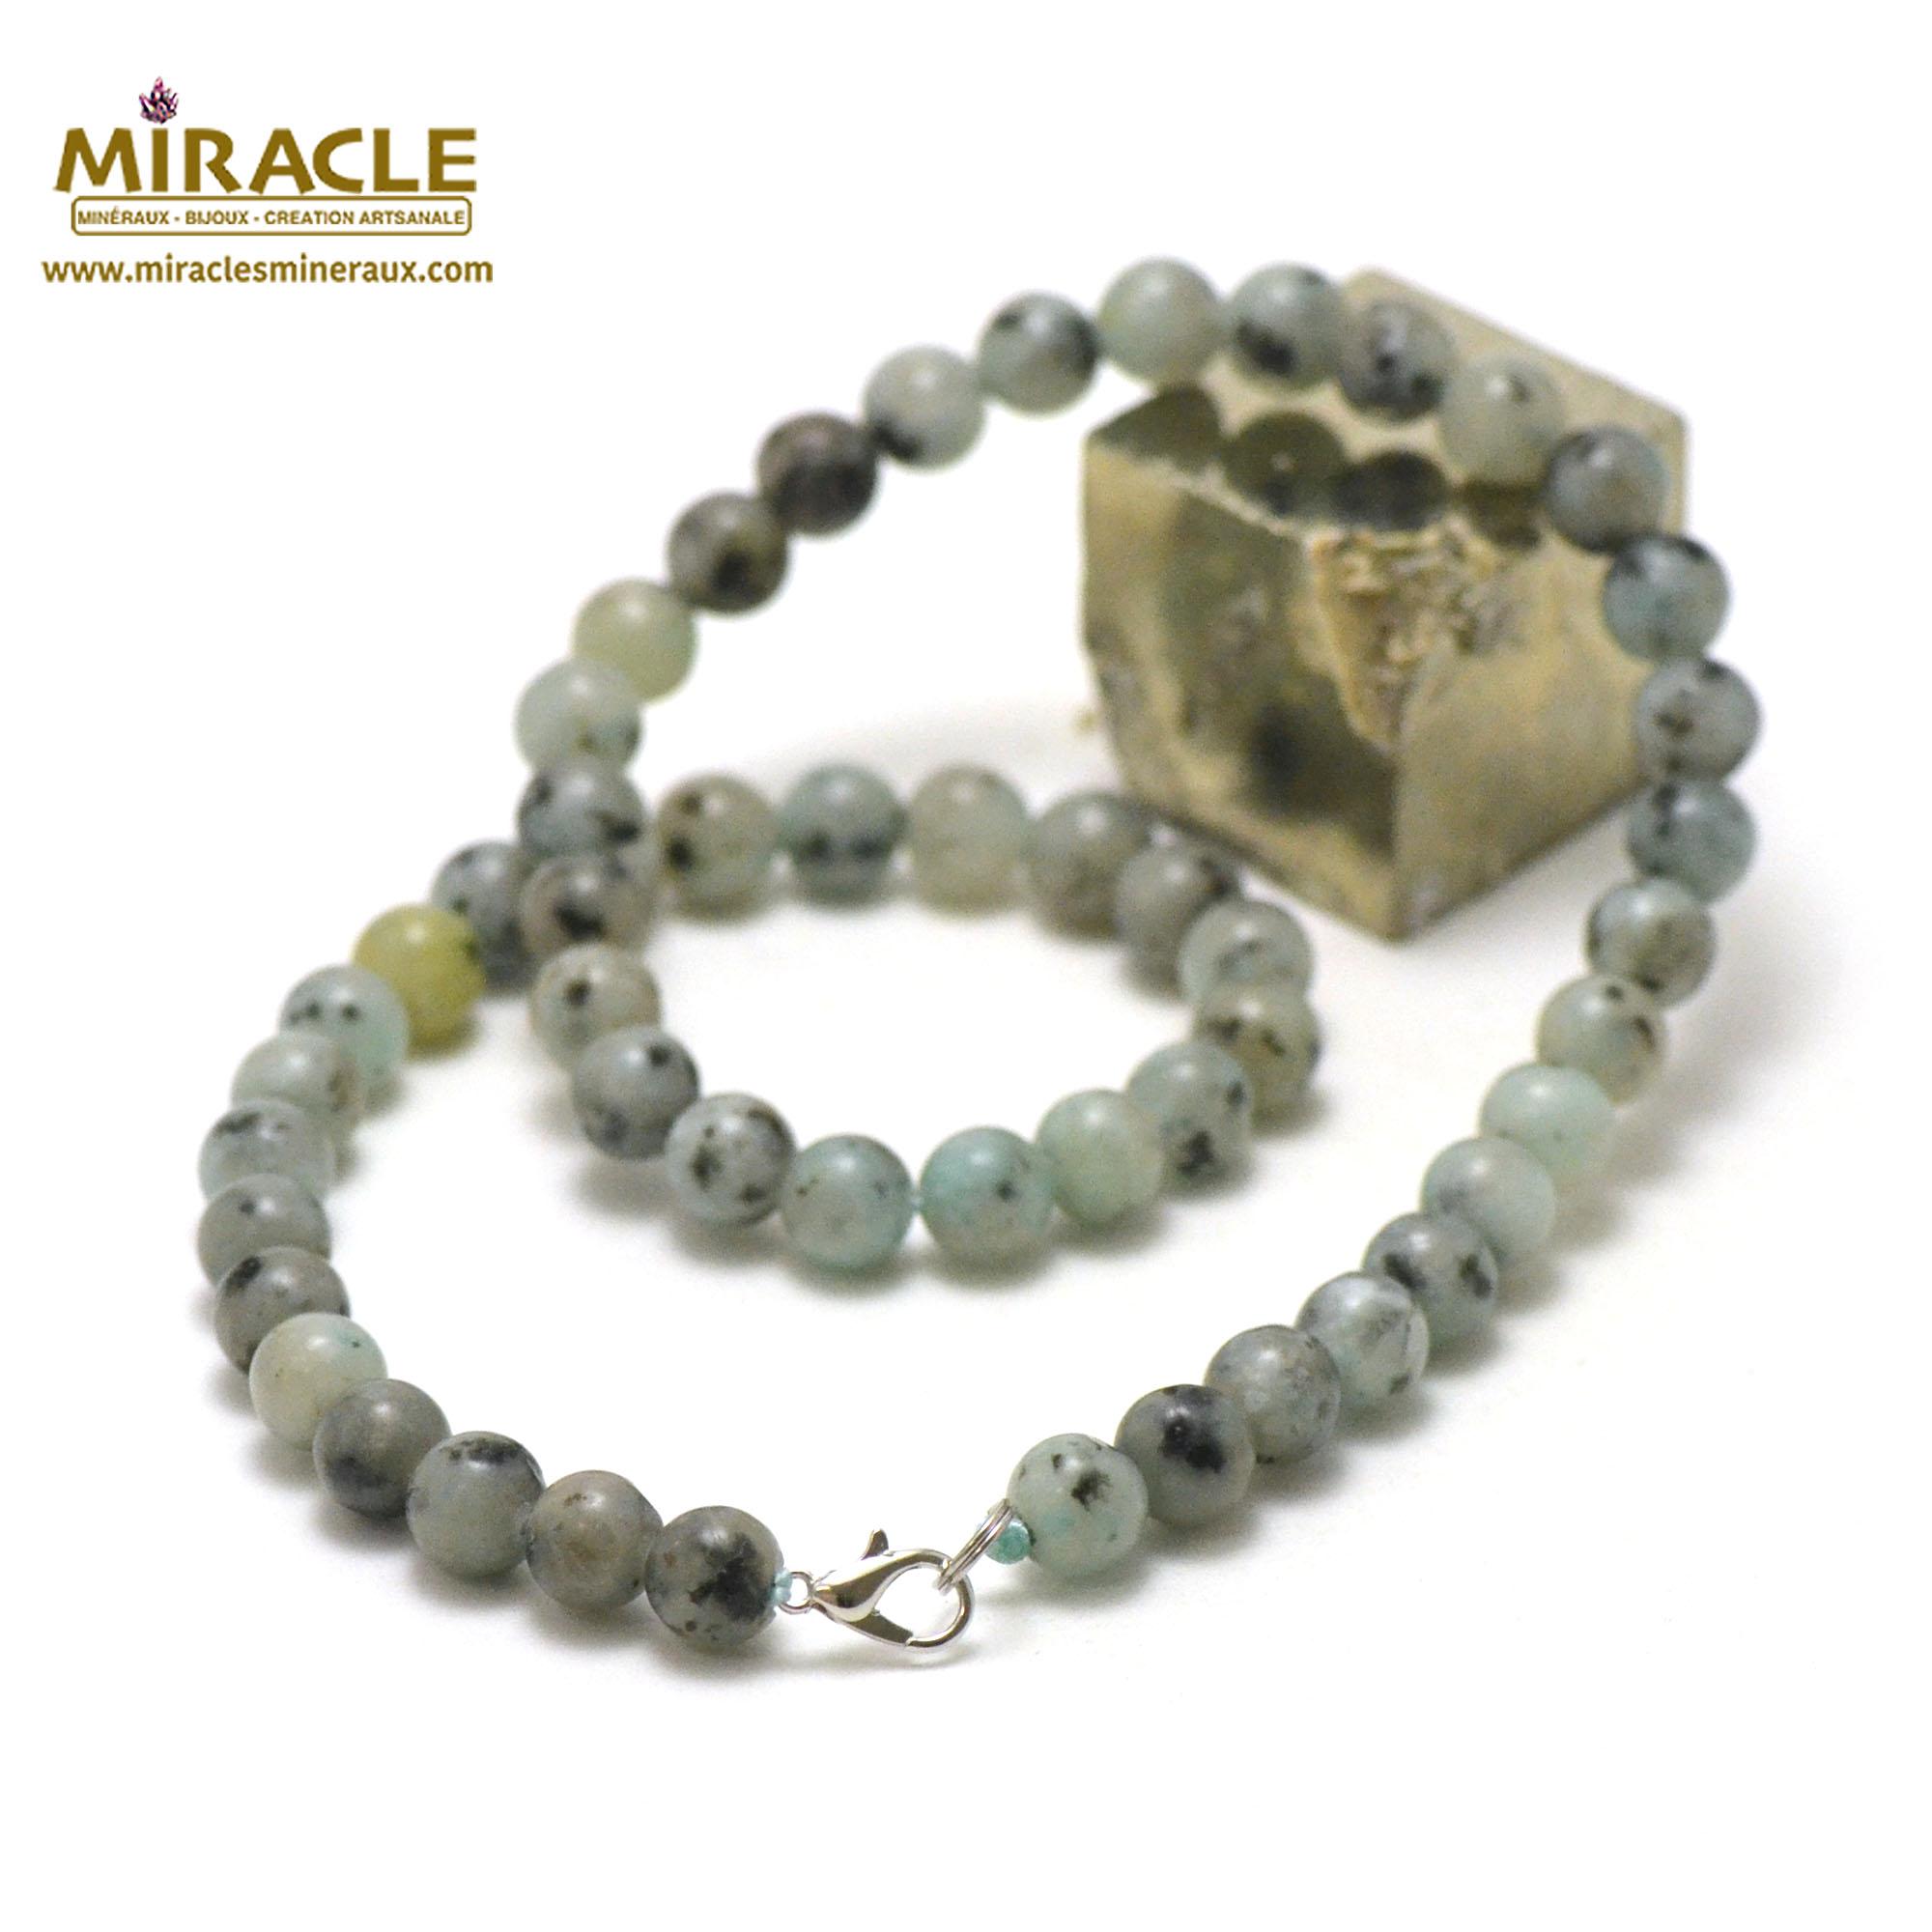 collier Jade néphrite des Andes perle ronde 8 mm